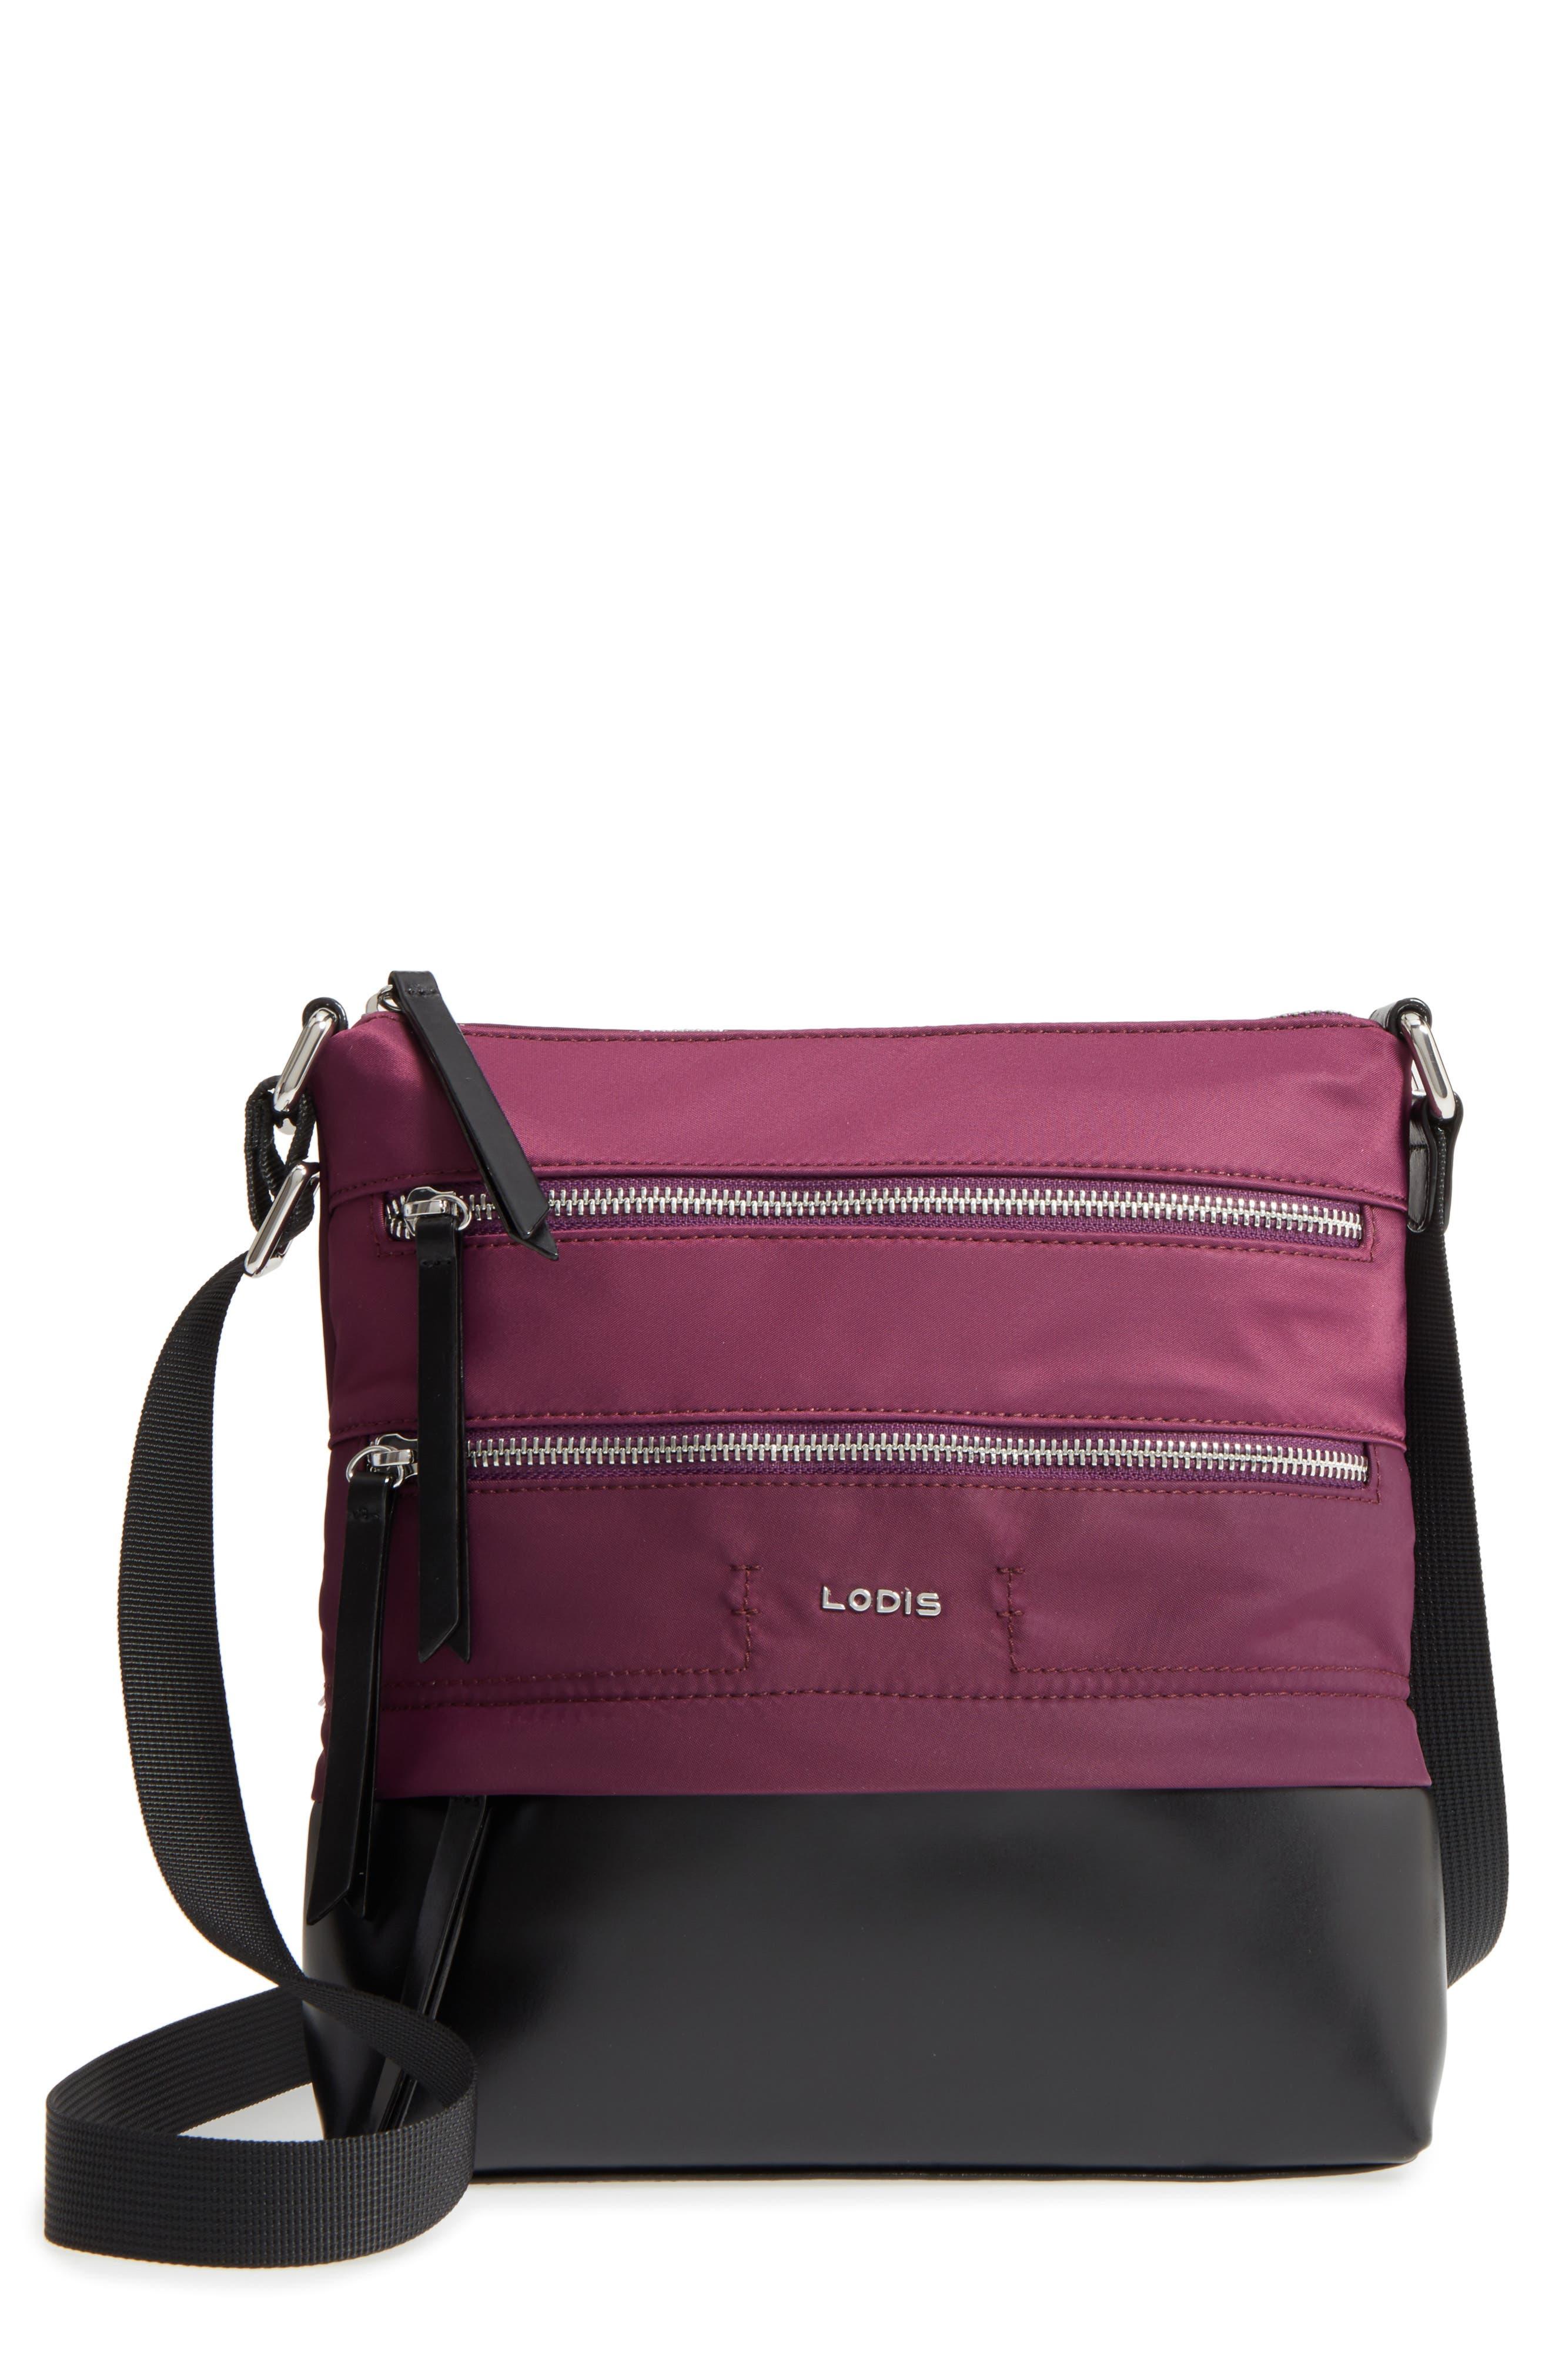 Wanda RFID Nylon & Leather Crossbody Bag,                         Main,                         color, 500